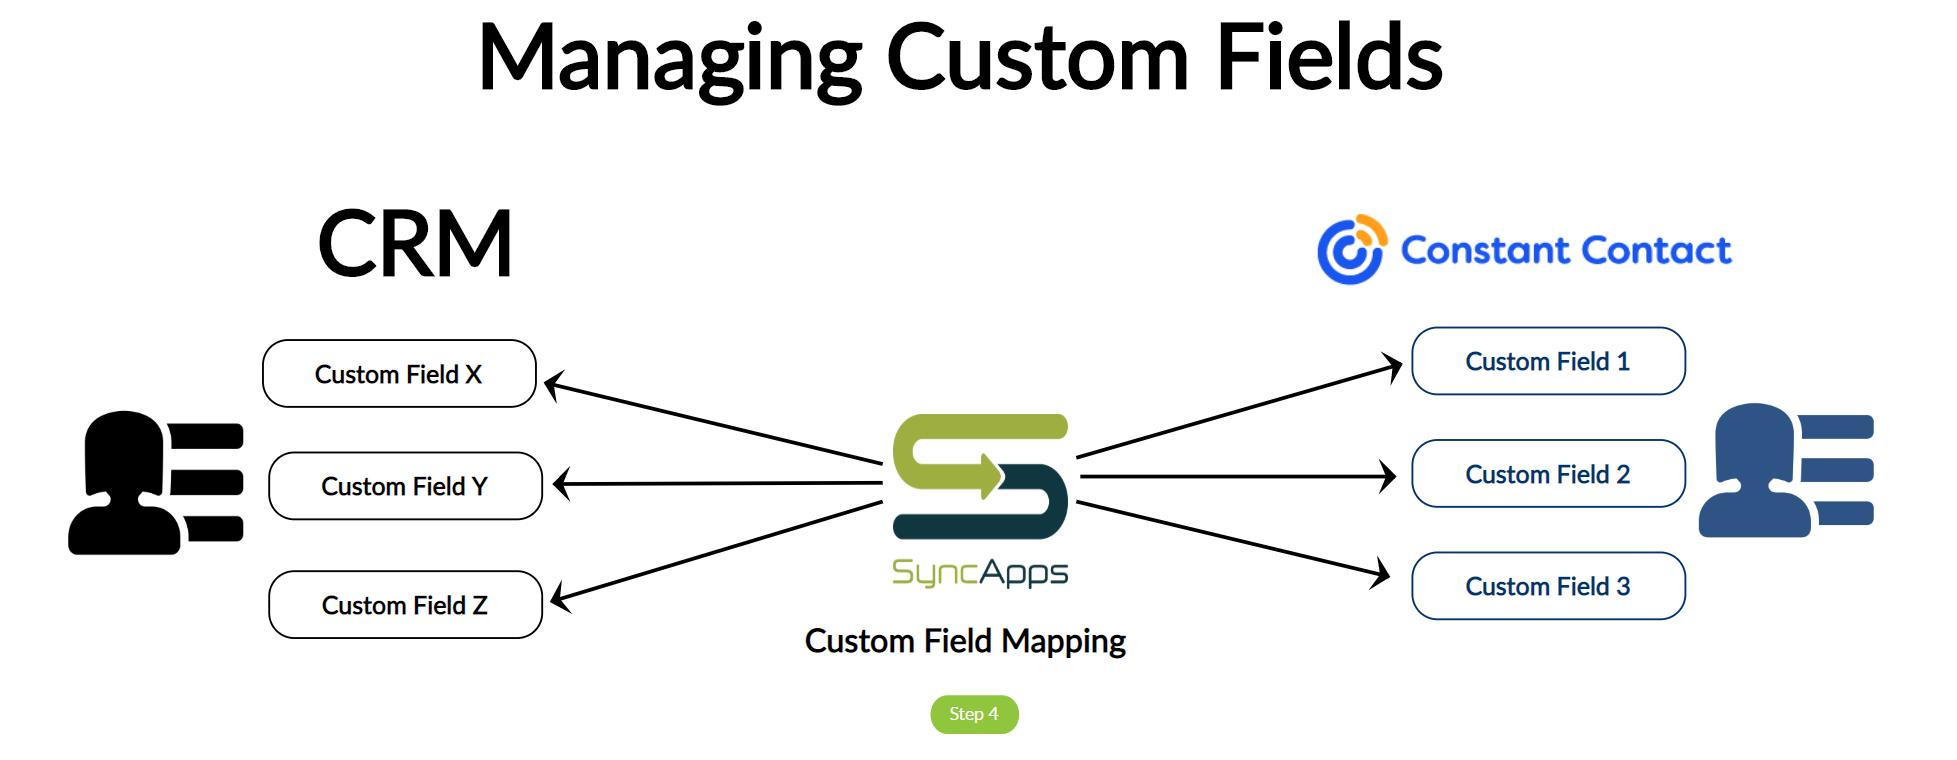 Managing-Custom-Field-Creately.png